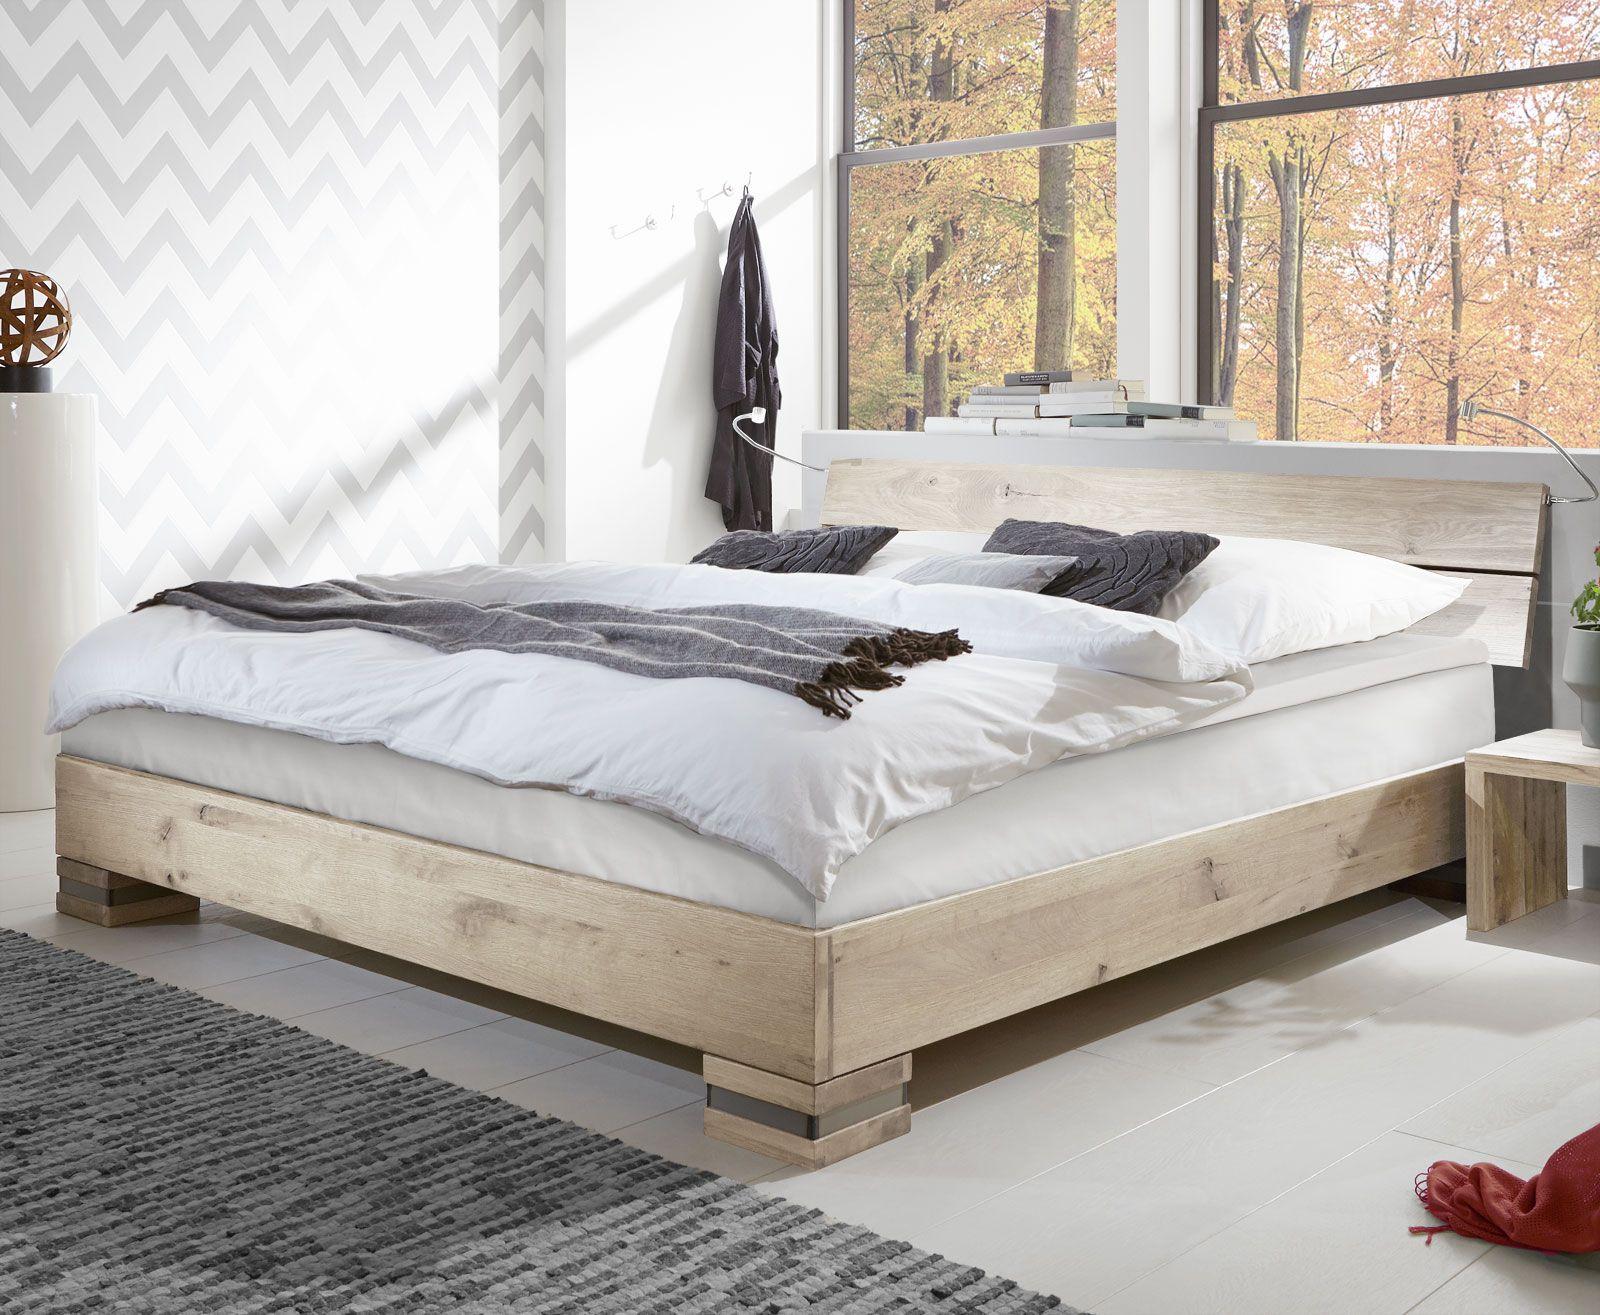 Boxspringbett Mexiana Bett Mit Lattenrost Haus Deko Und